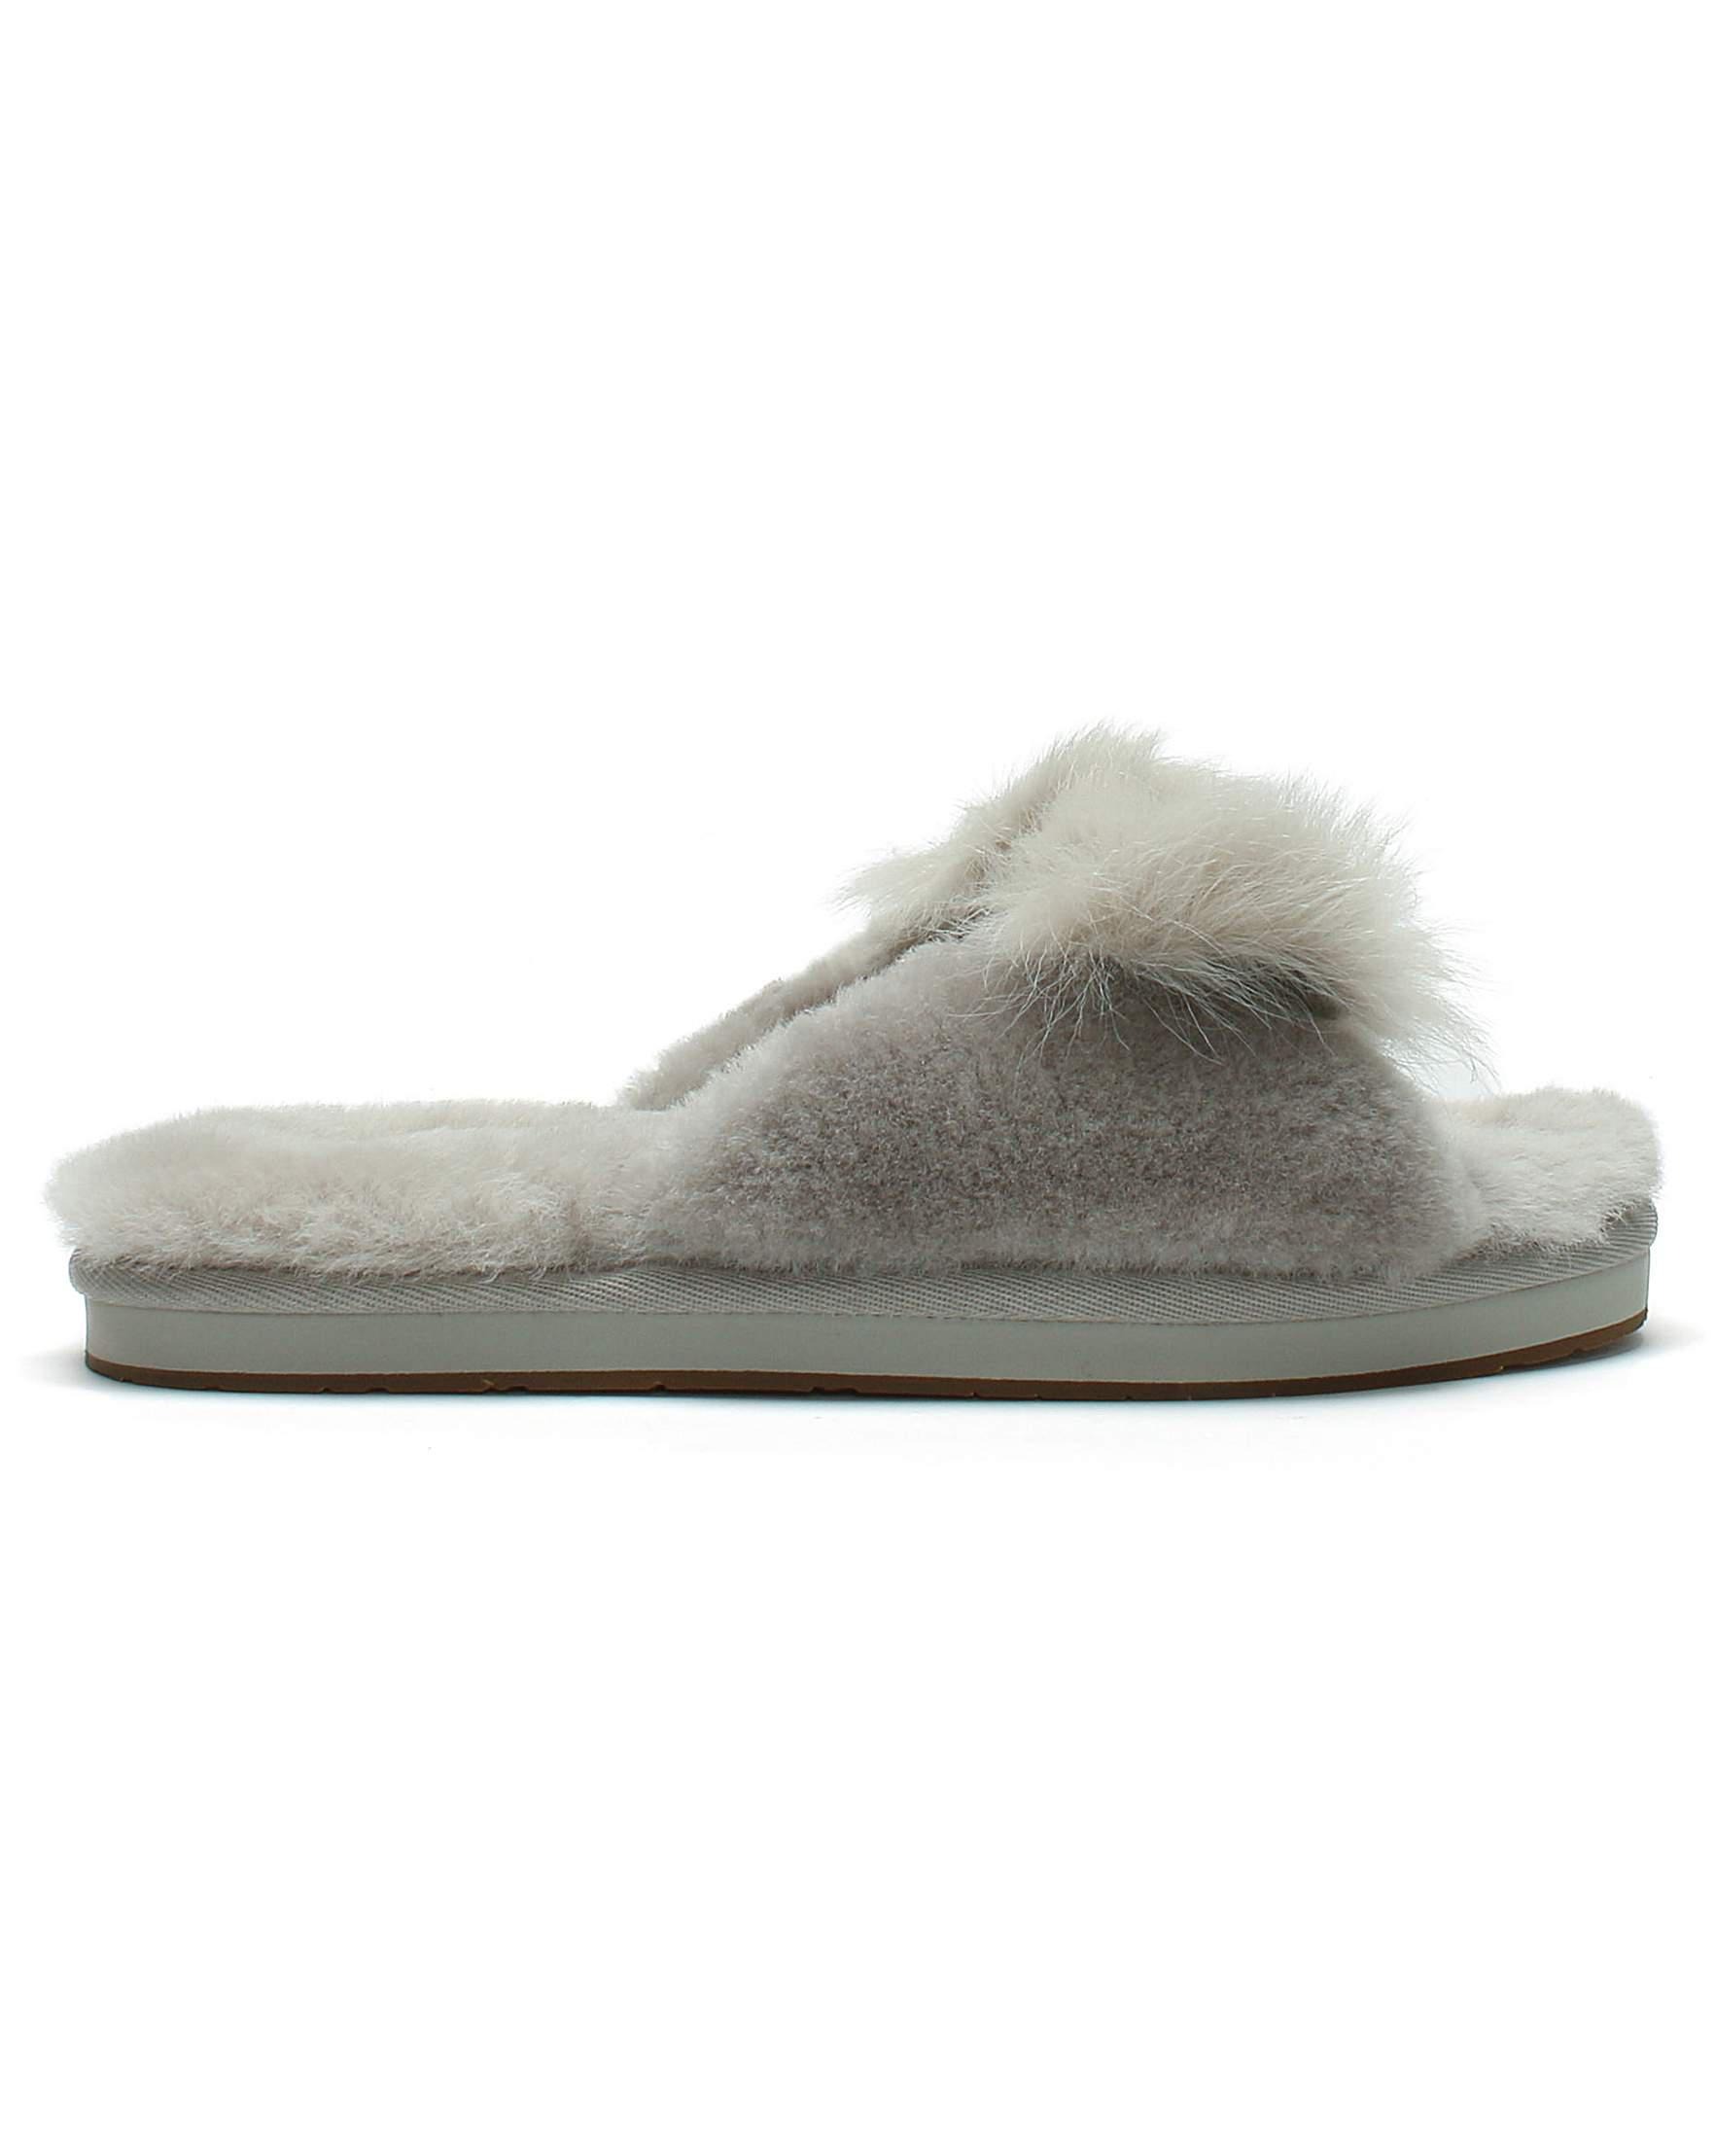 c4711f8253 Ugg Mirabelle Sheepskin Slippers in Gray - Lyst